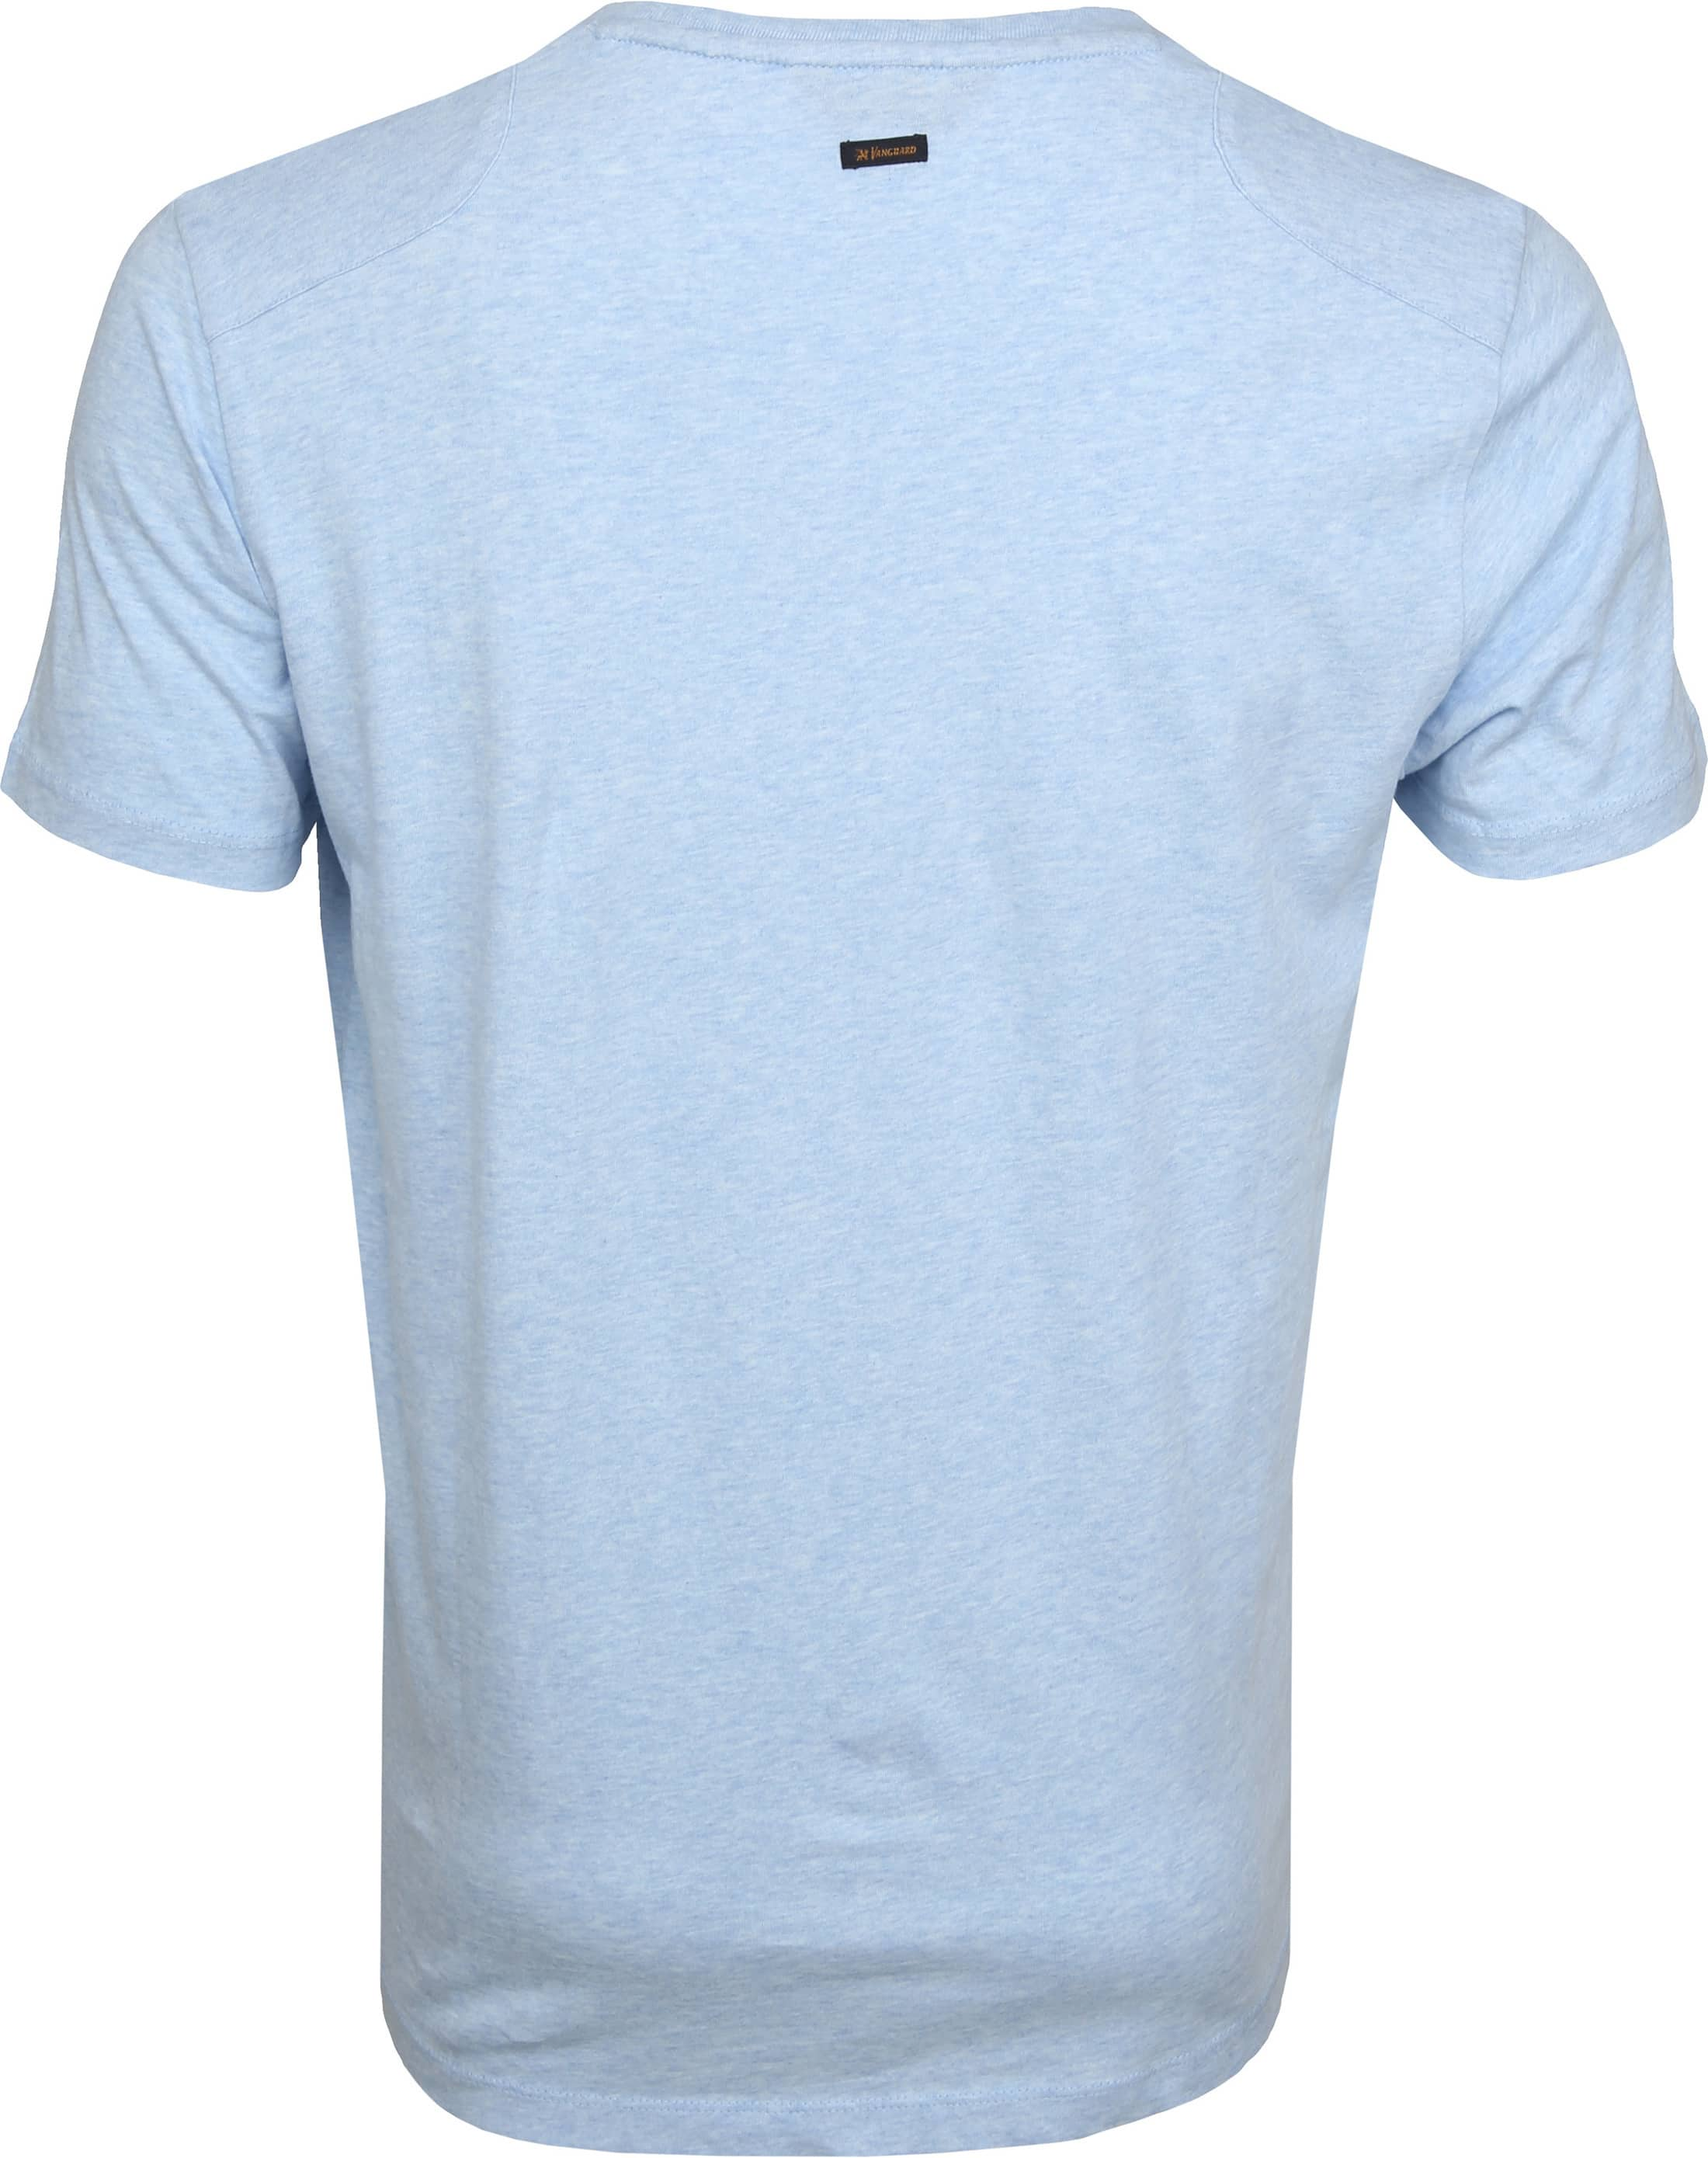 Vanguard T-shirt Lichtblauw Print foto 2